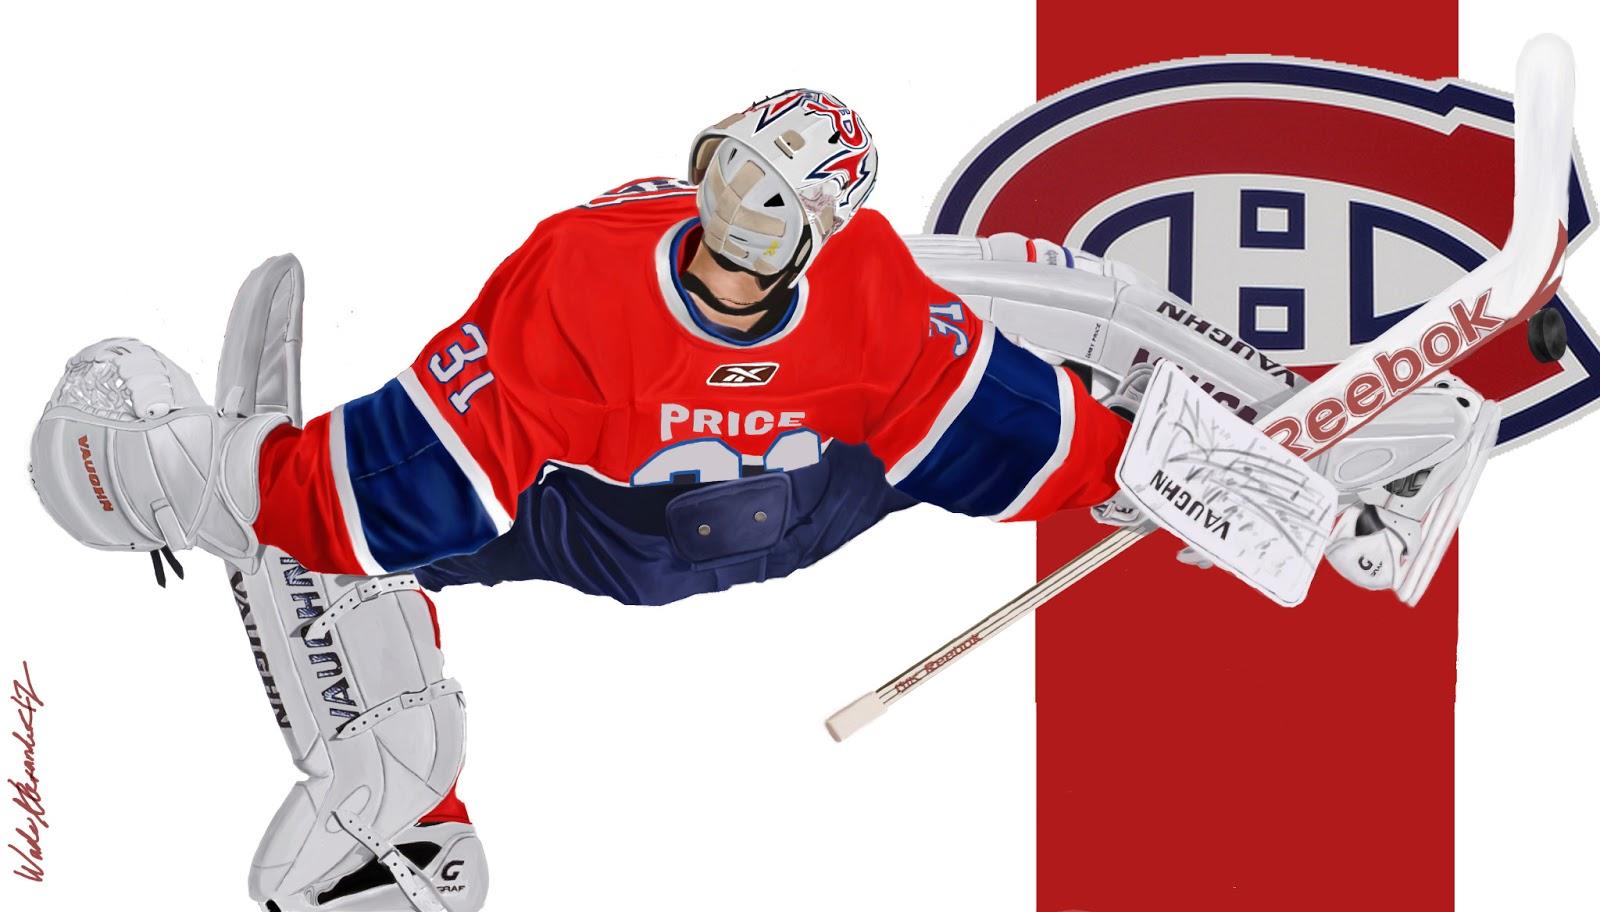 Carey price wallpapers montreal habs montreal hockey 9 html code - Carey Price